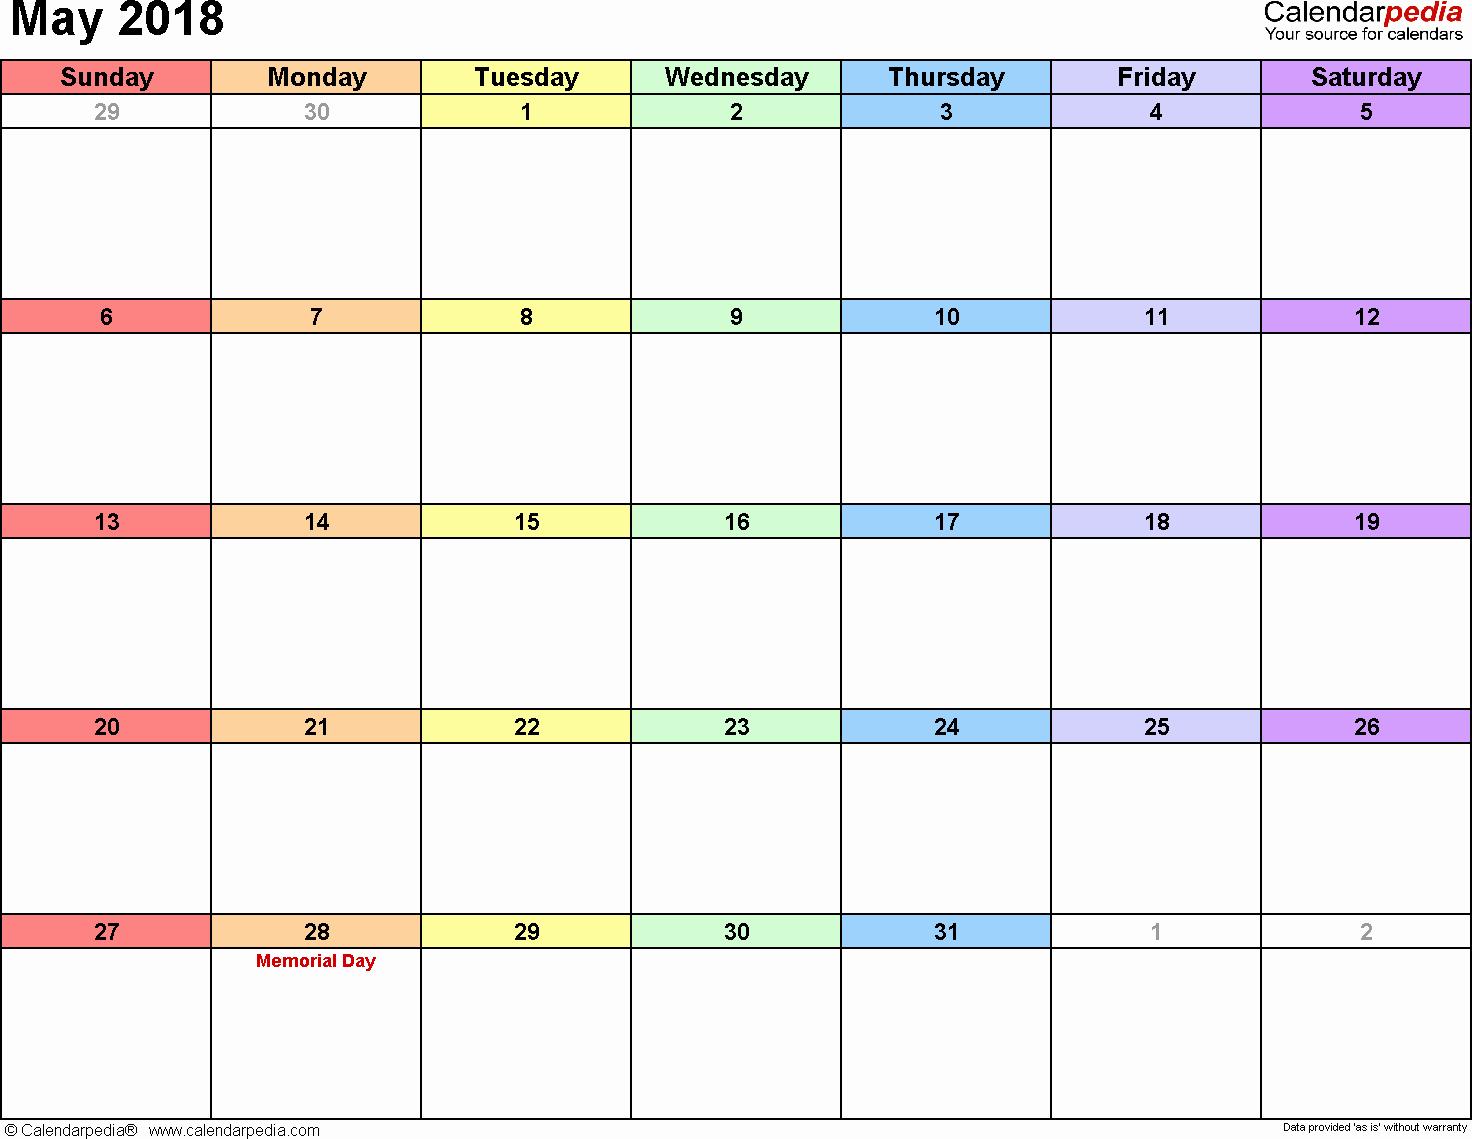 Free Printable 2018 Calendar Templates Elegant May 2018 Calendar Template